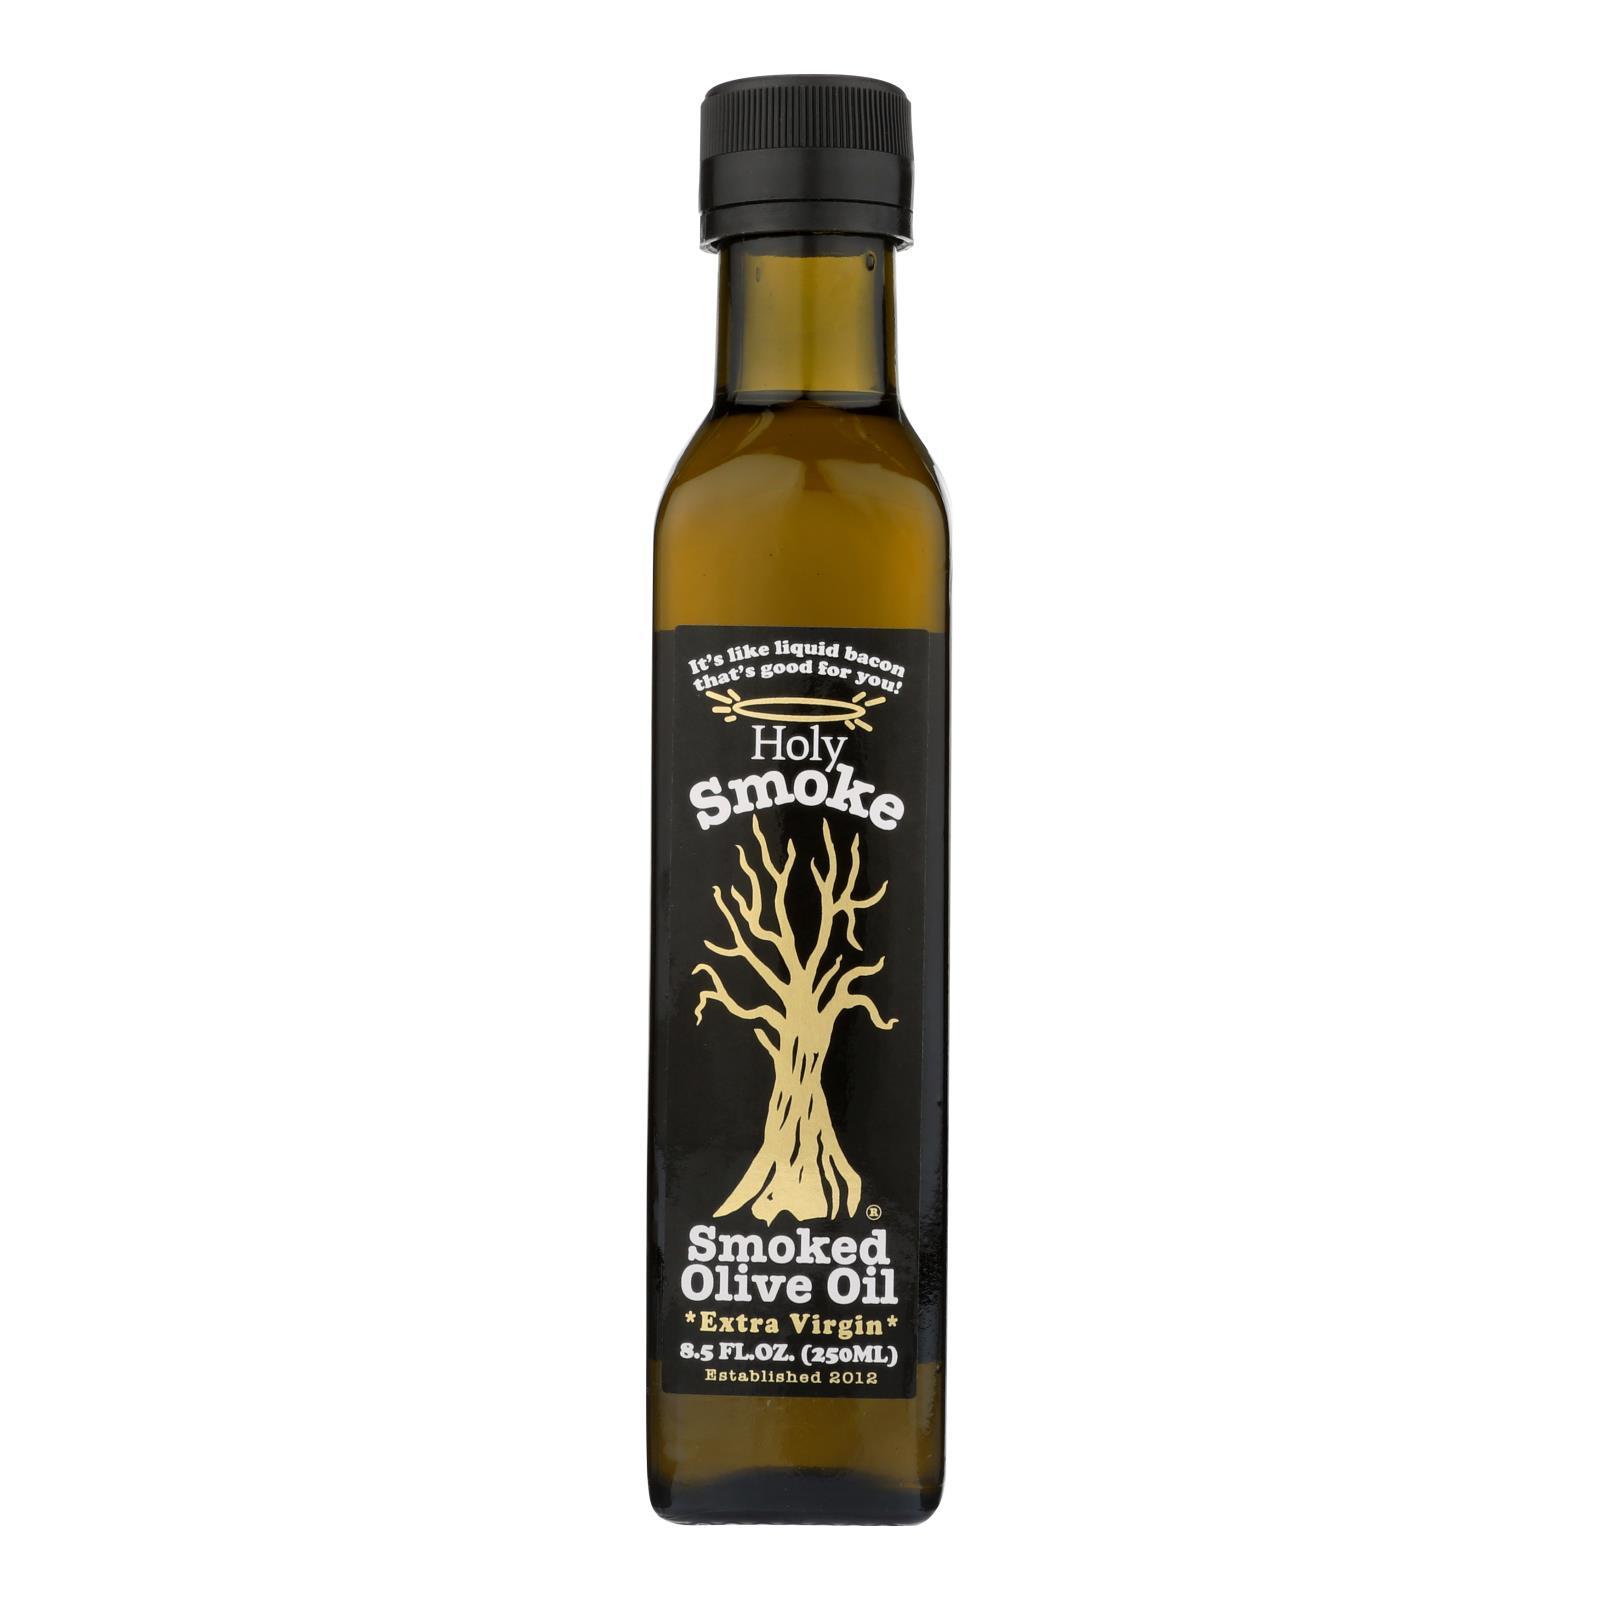 Holy Smoke - Oil Olive Ev Smoked - Case of 6 - 8.5 FZ